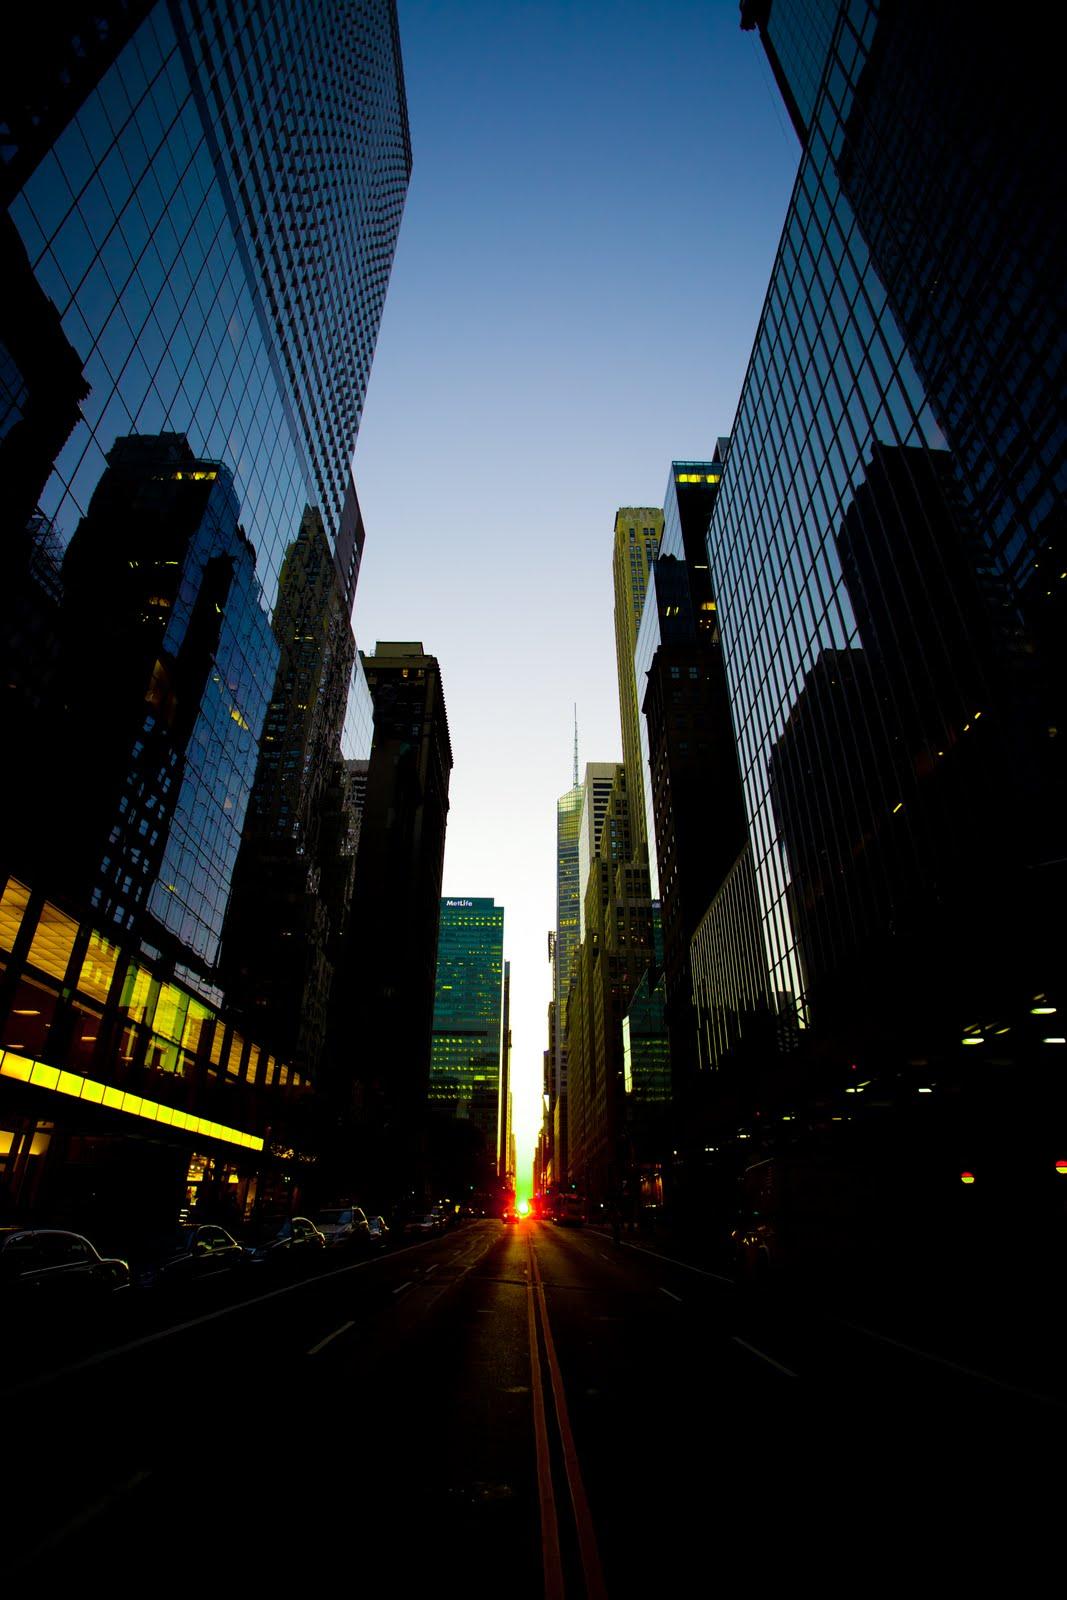 2011 Manhattan New York Trip: Aemiessence Fine Arts: Manhattan Henge: July 12th, 2011